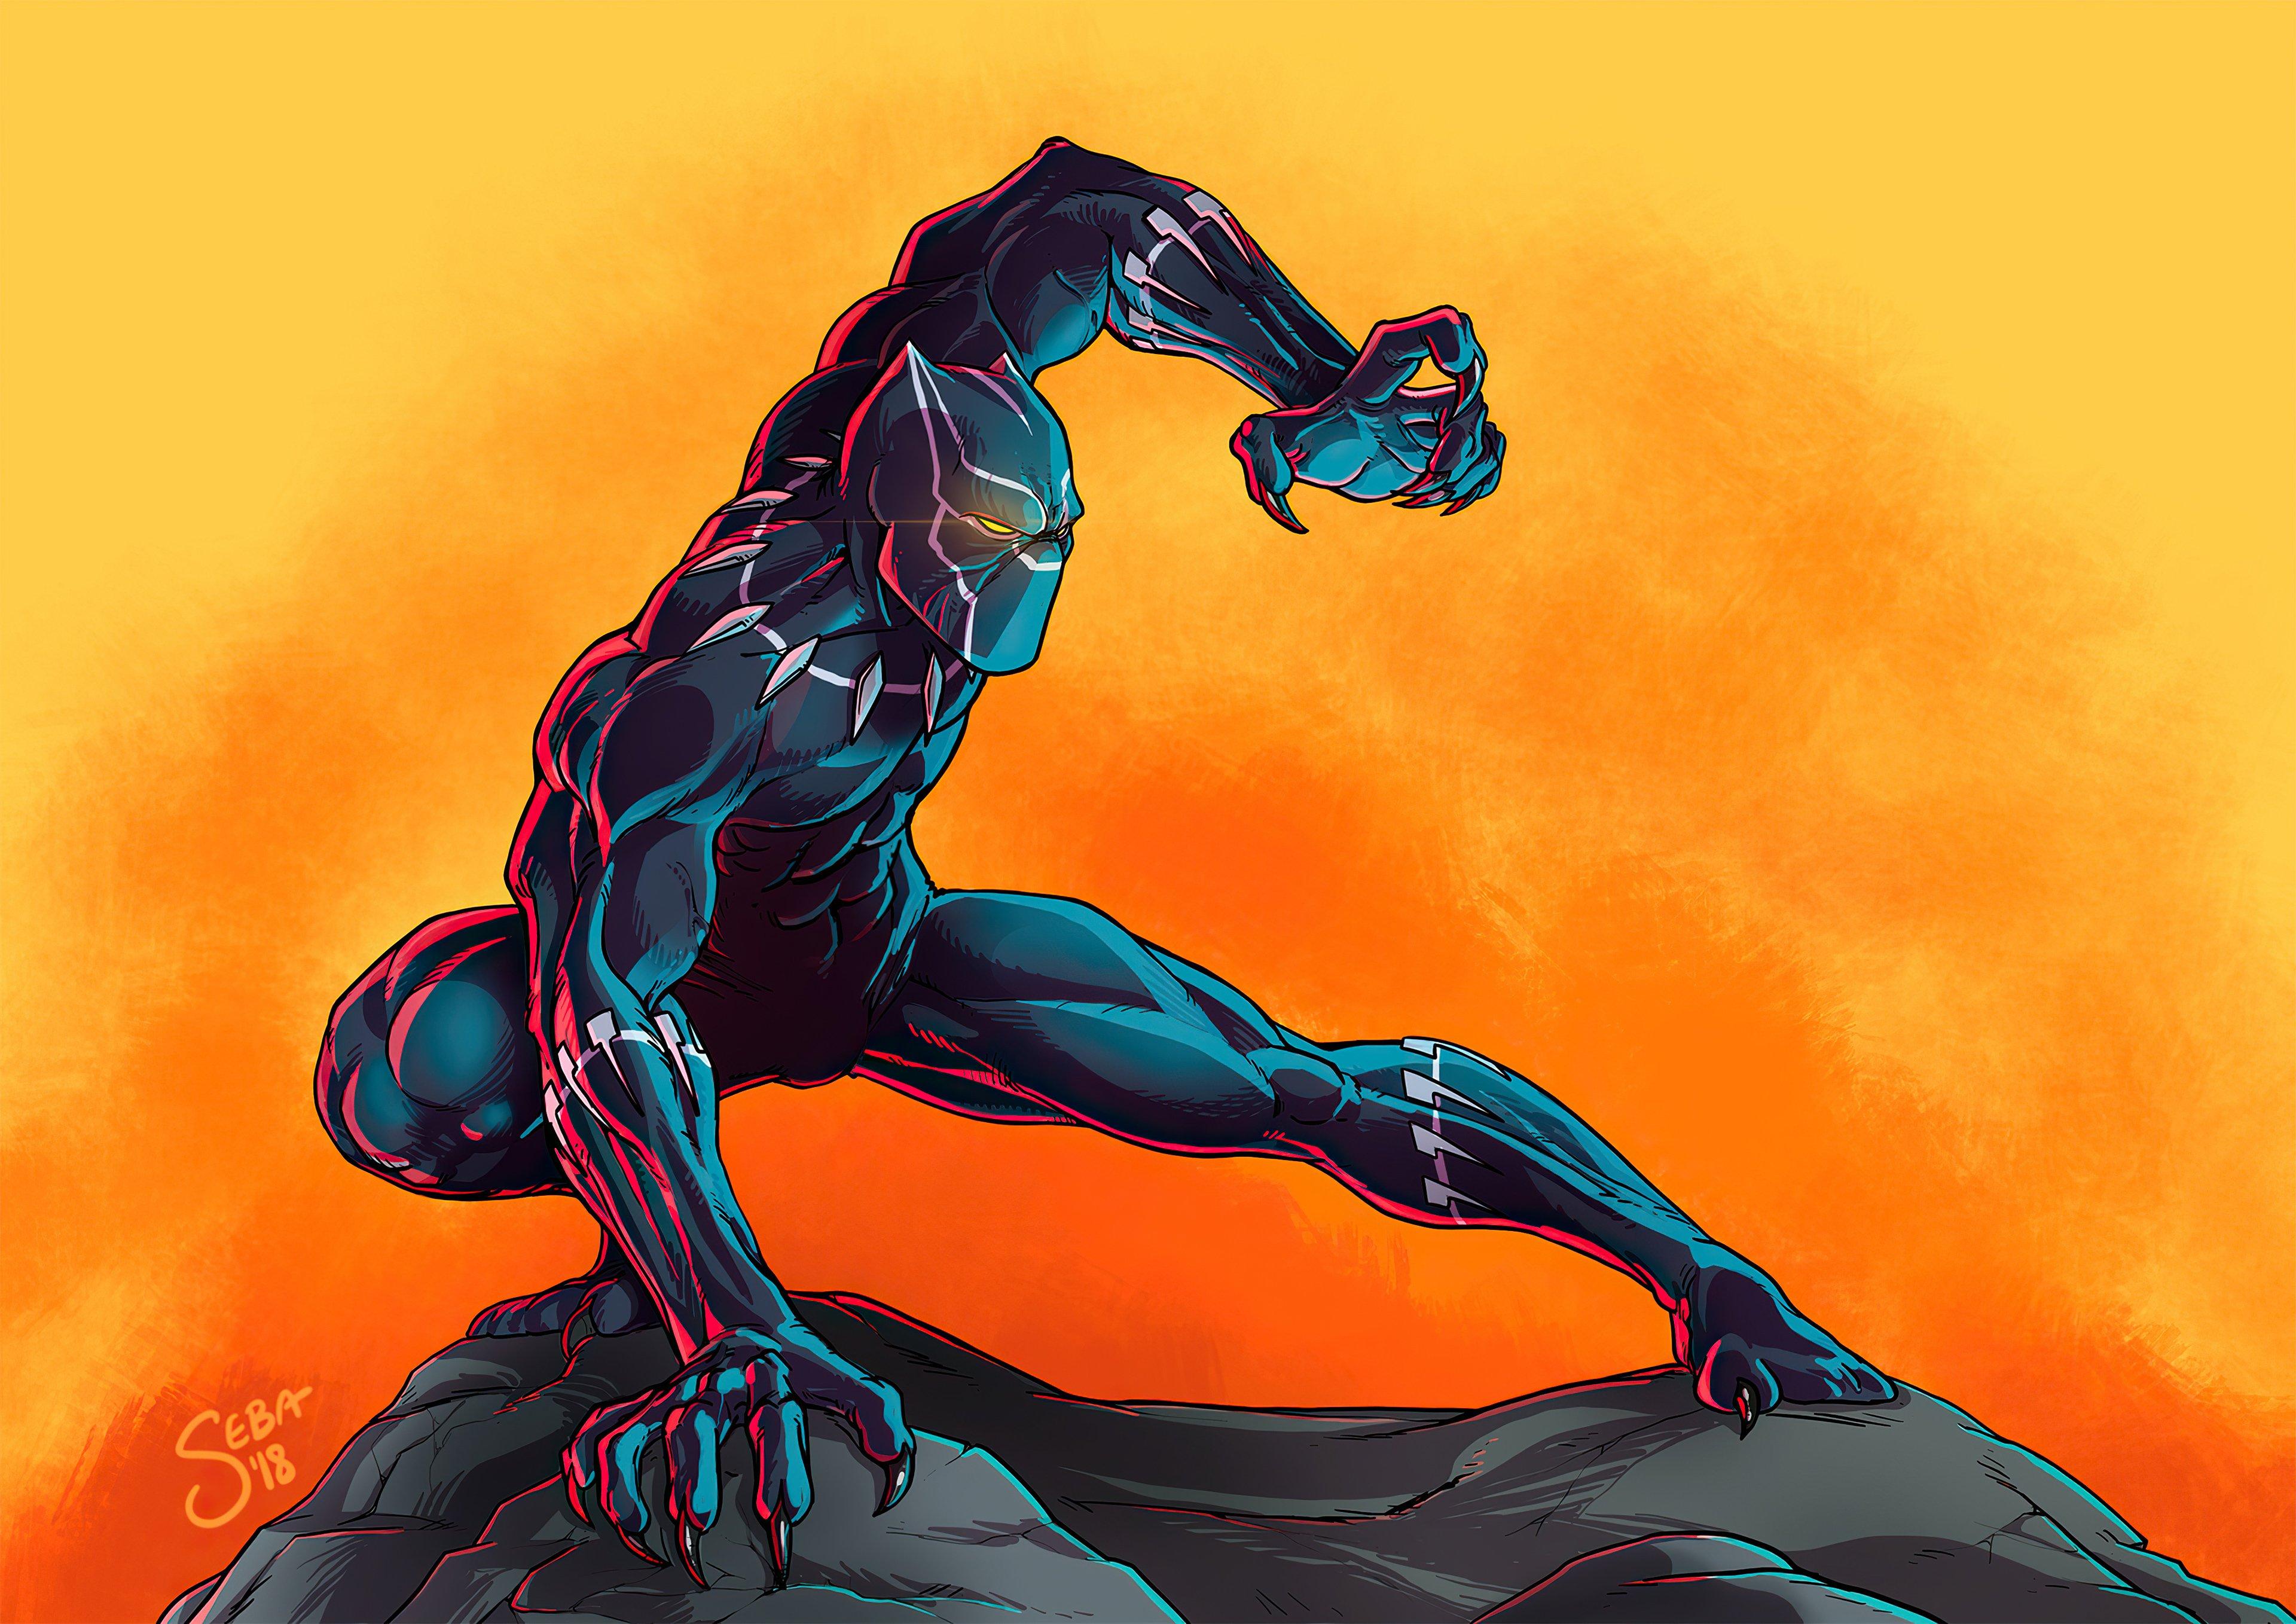 Fondos de pantalla Pantera negra Pintura de Arte Digital